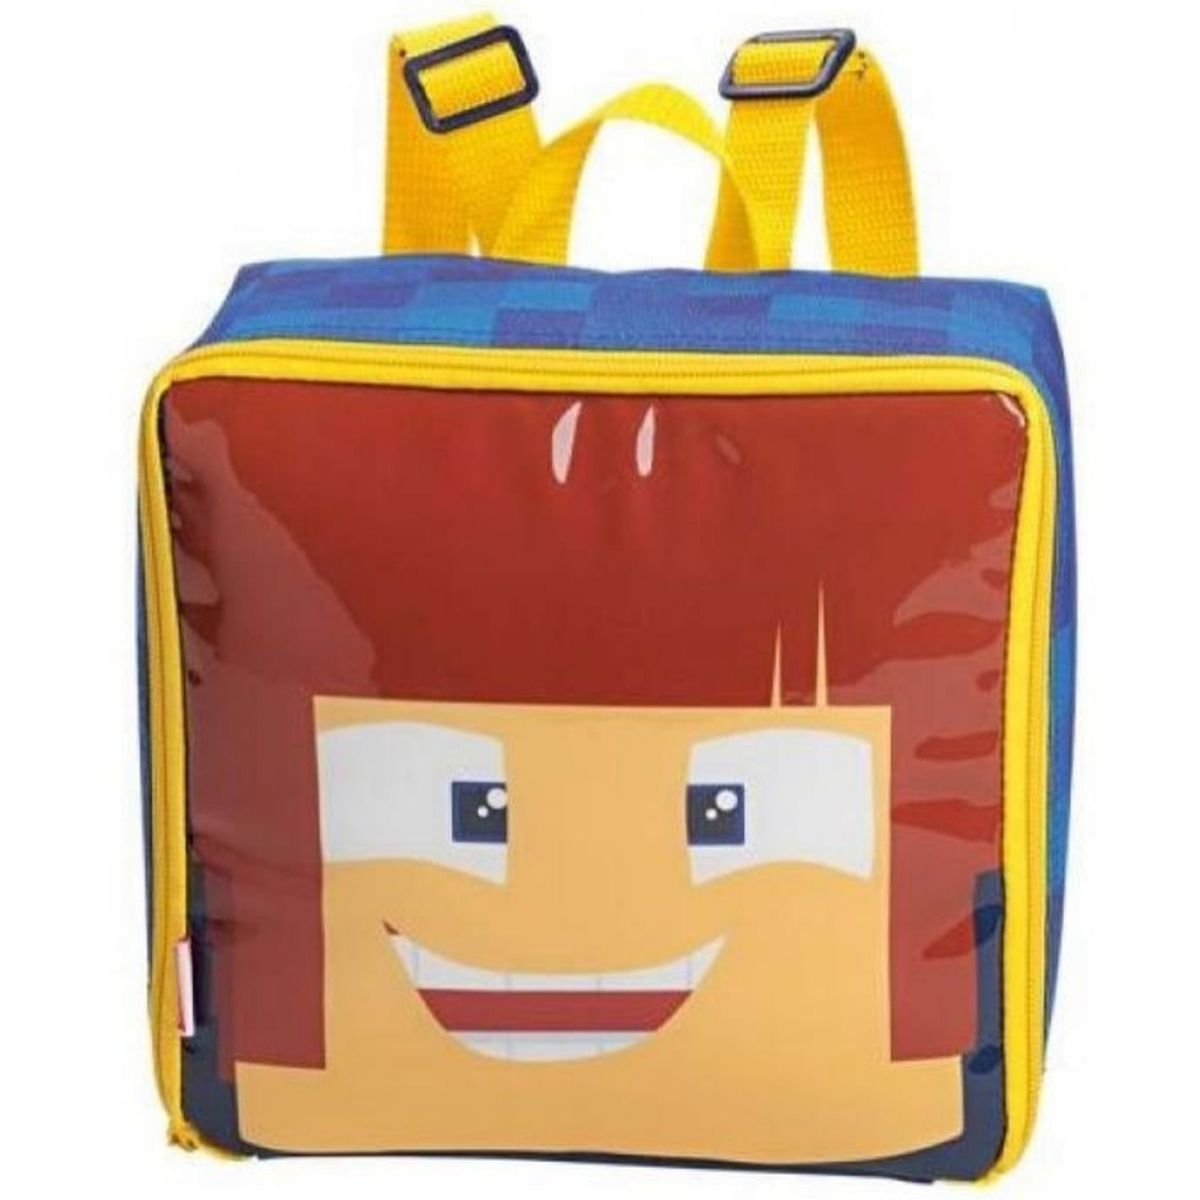 Lancheira Infantil Escolar Authentic Games 20M Sestini - 065572-00